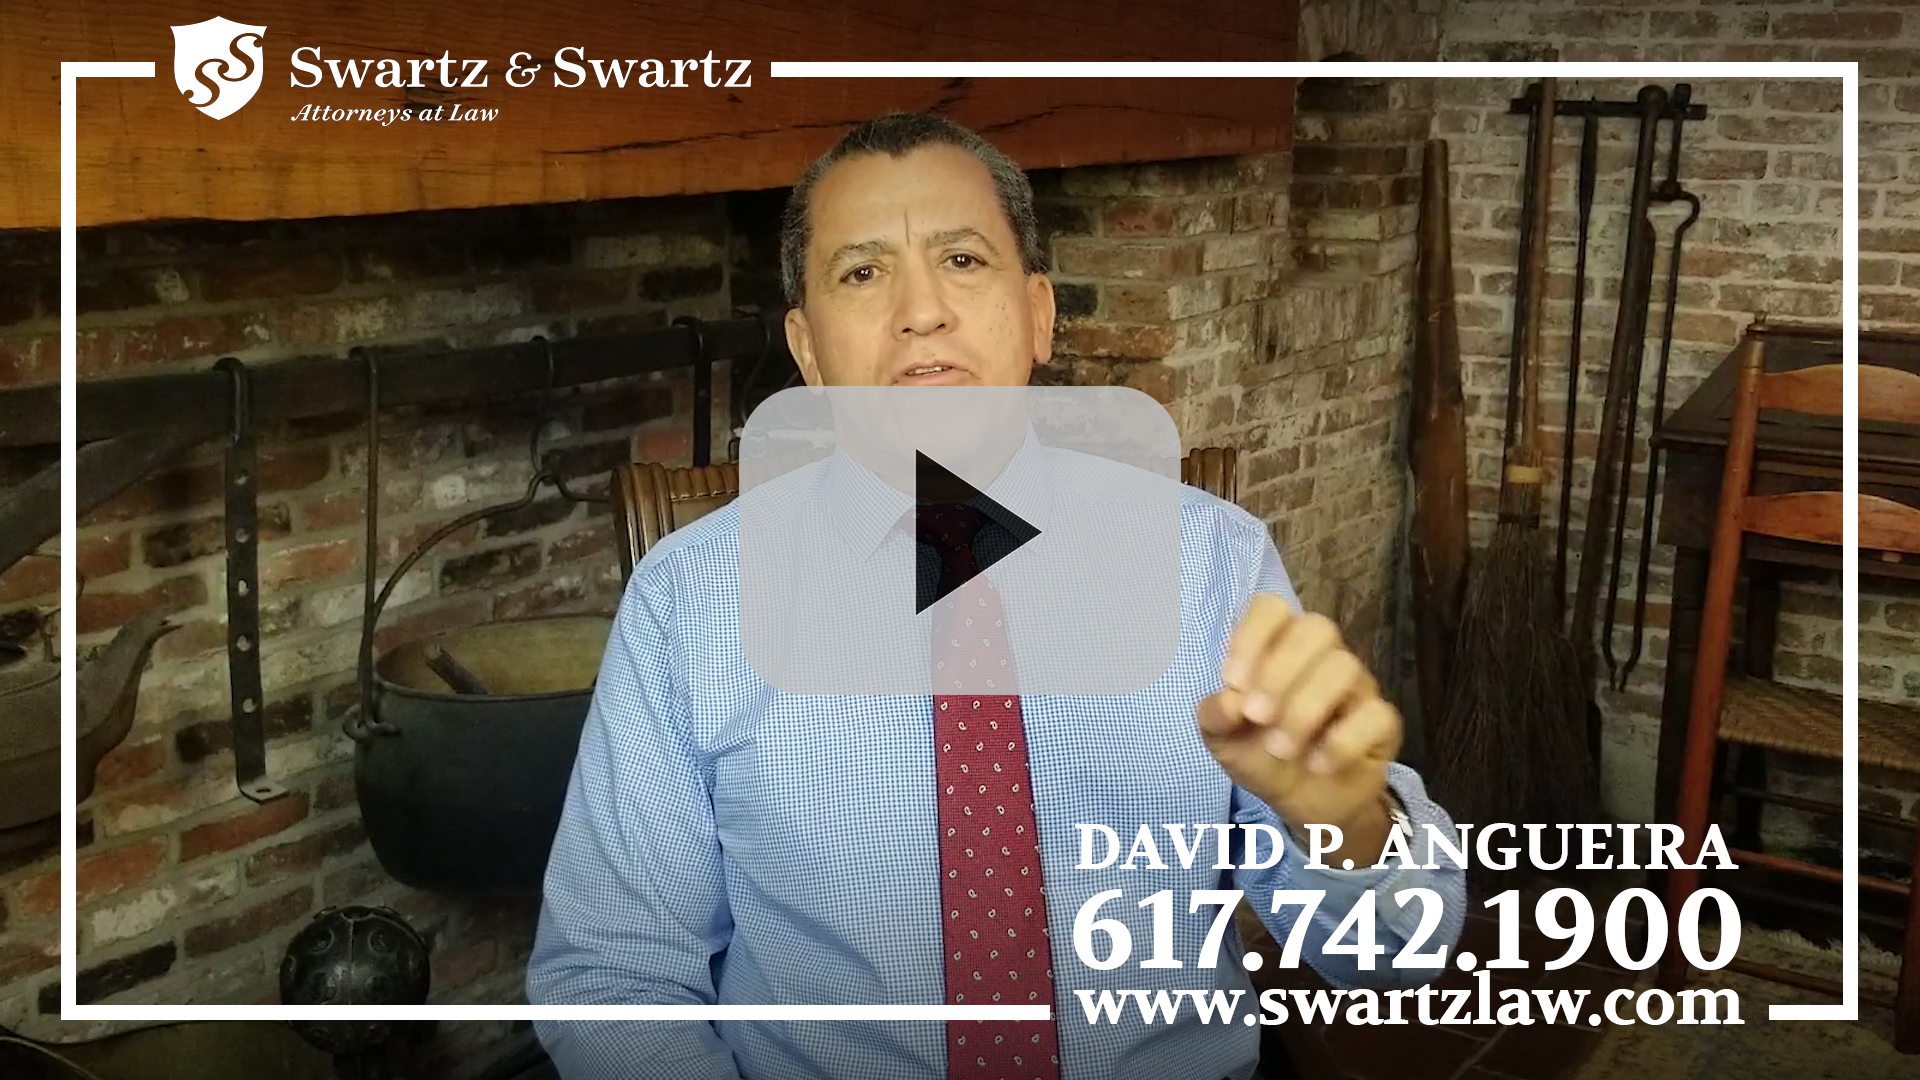 David Angueira – Hablamos español!